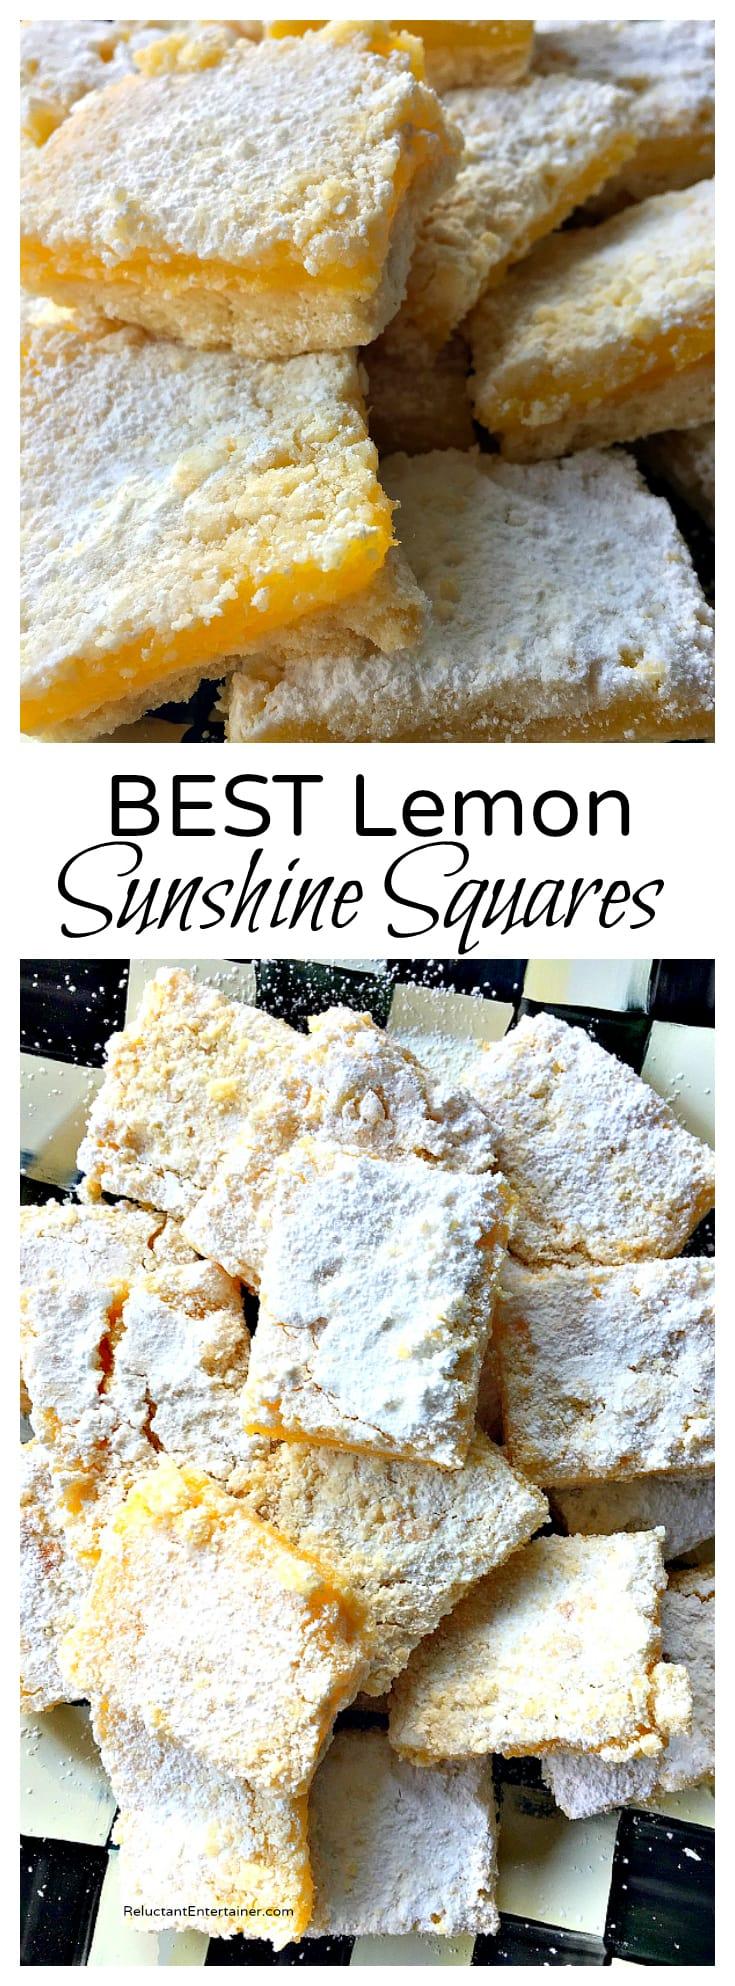 BEST Lemon Sunshine Squares Recipe